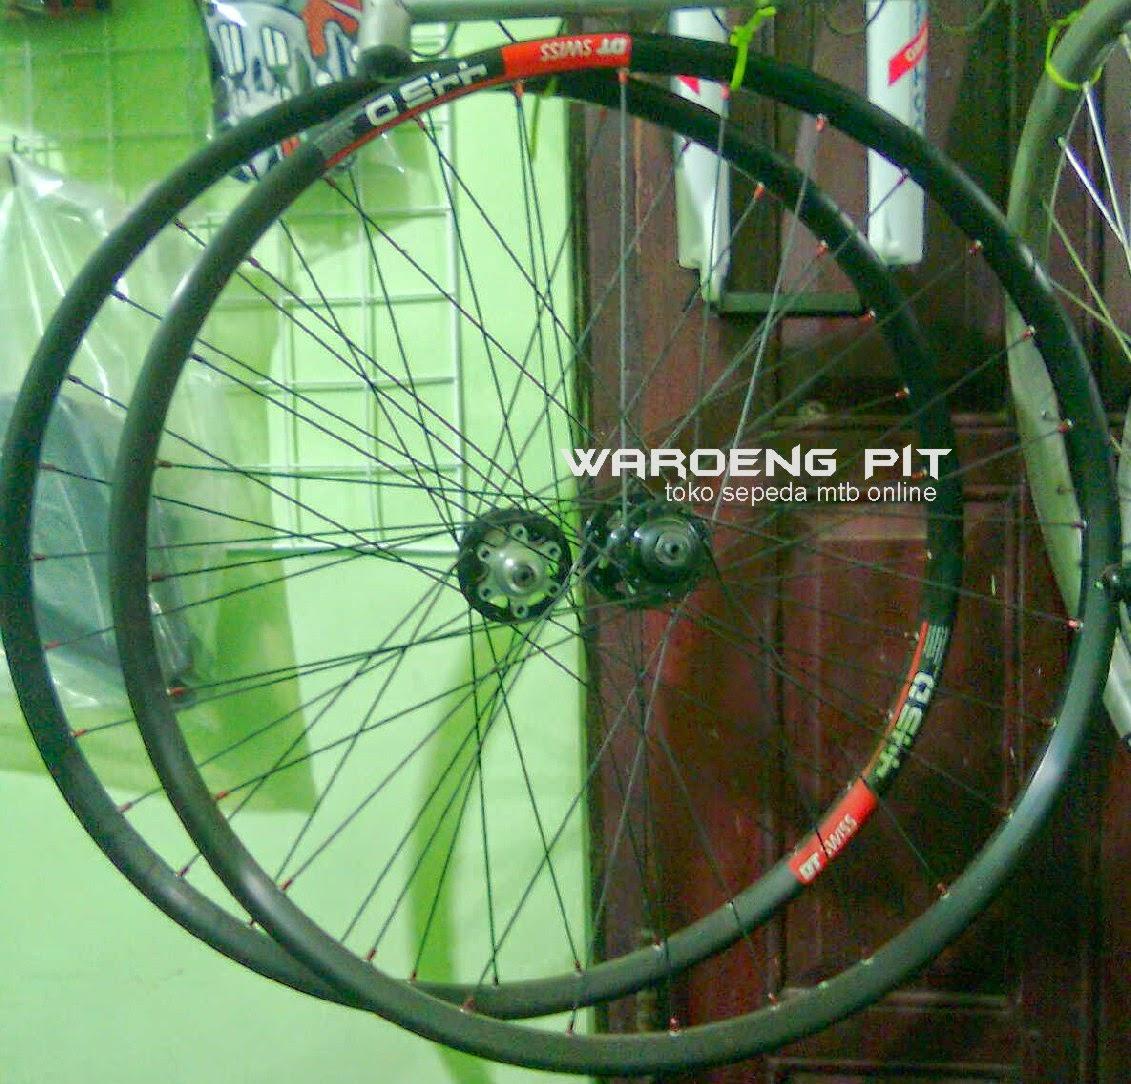 Jual wheelset DT Swiss Pelek Full lengkap Roda lengkap Rotor sepeda gunung mtb mountain bike sip.jpg